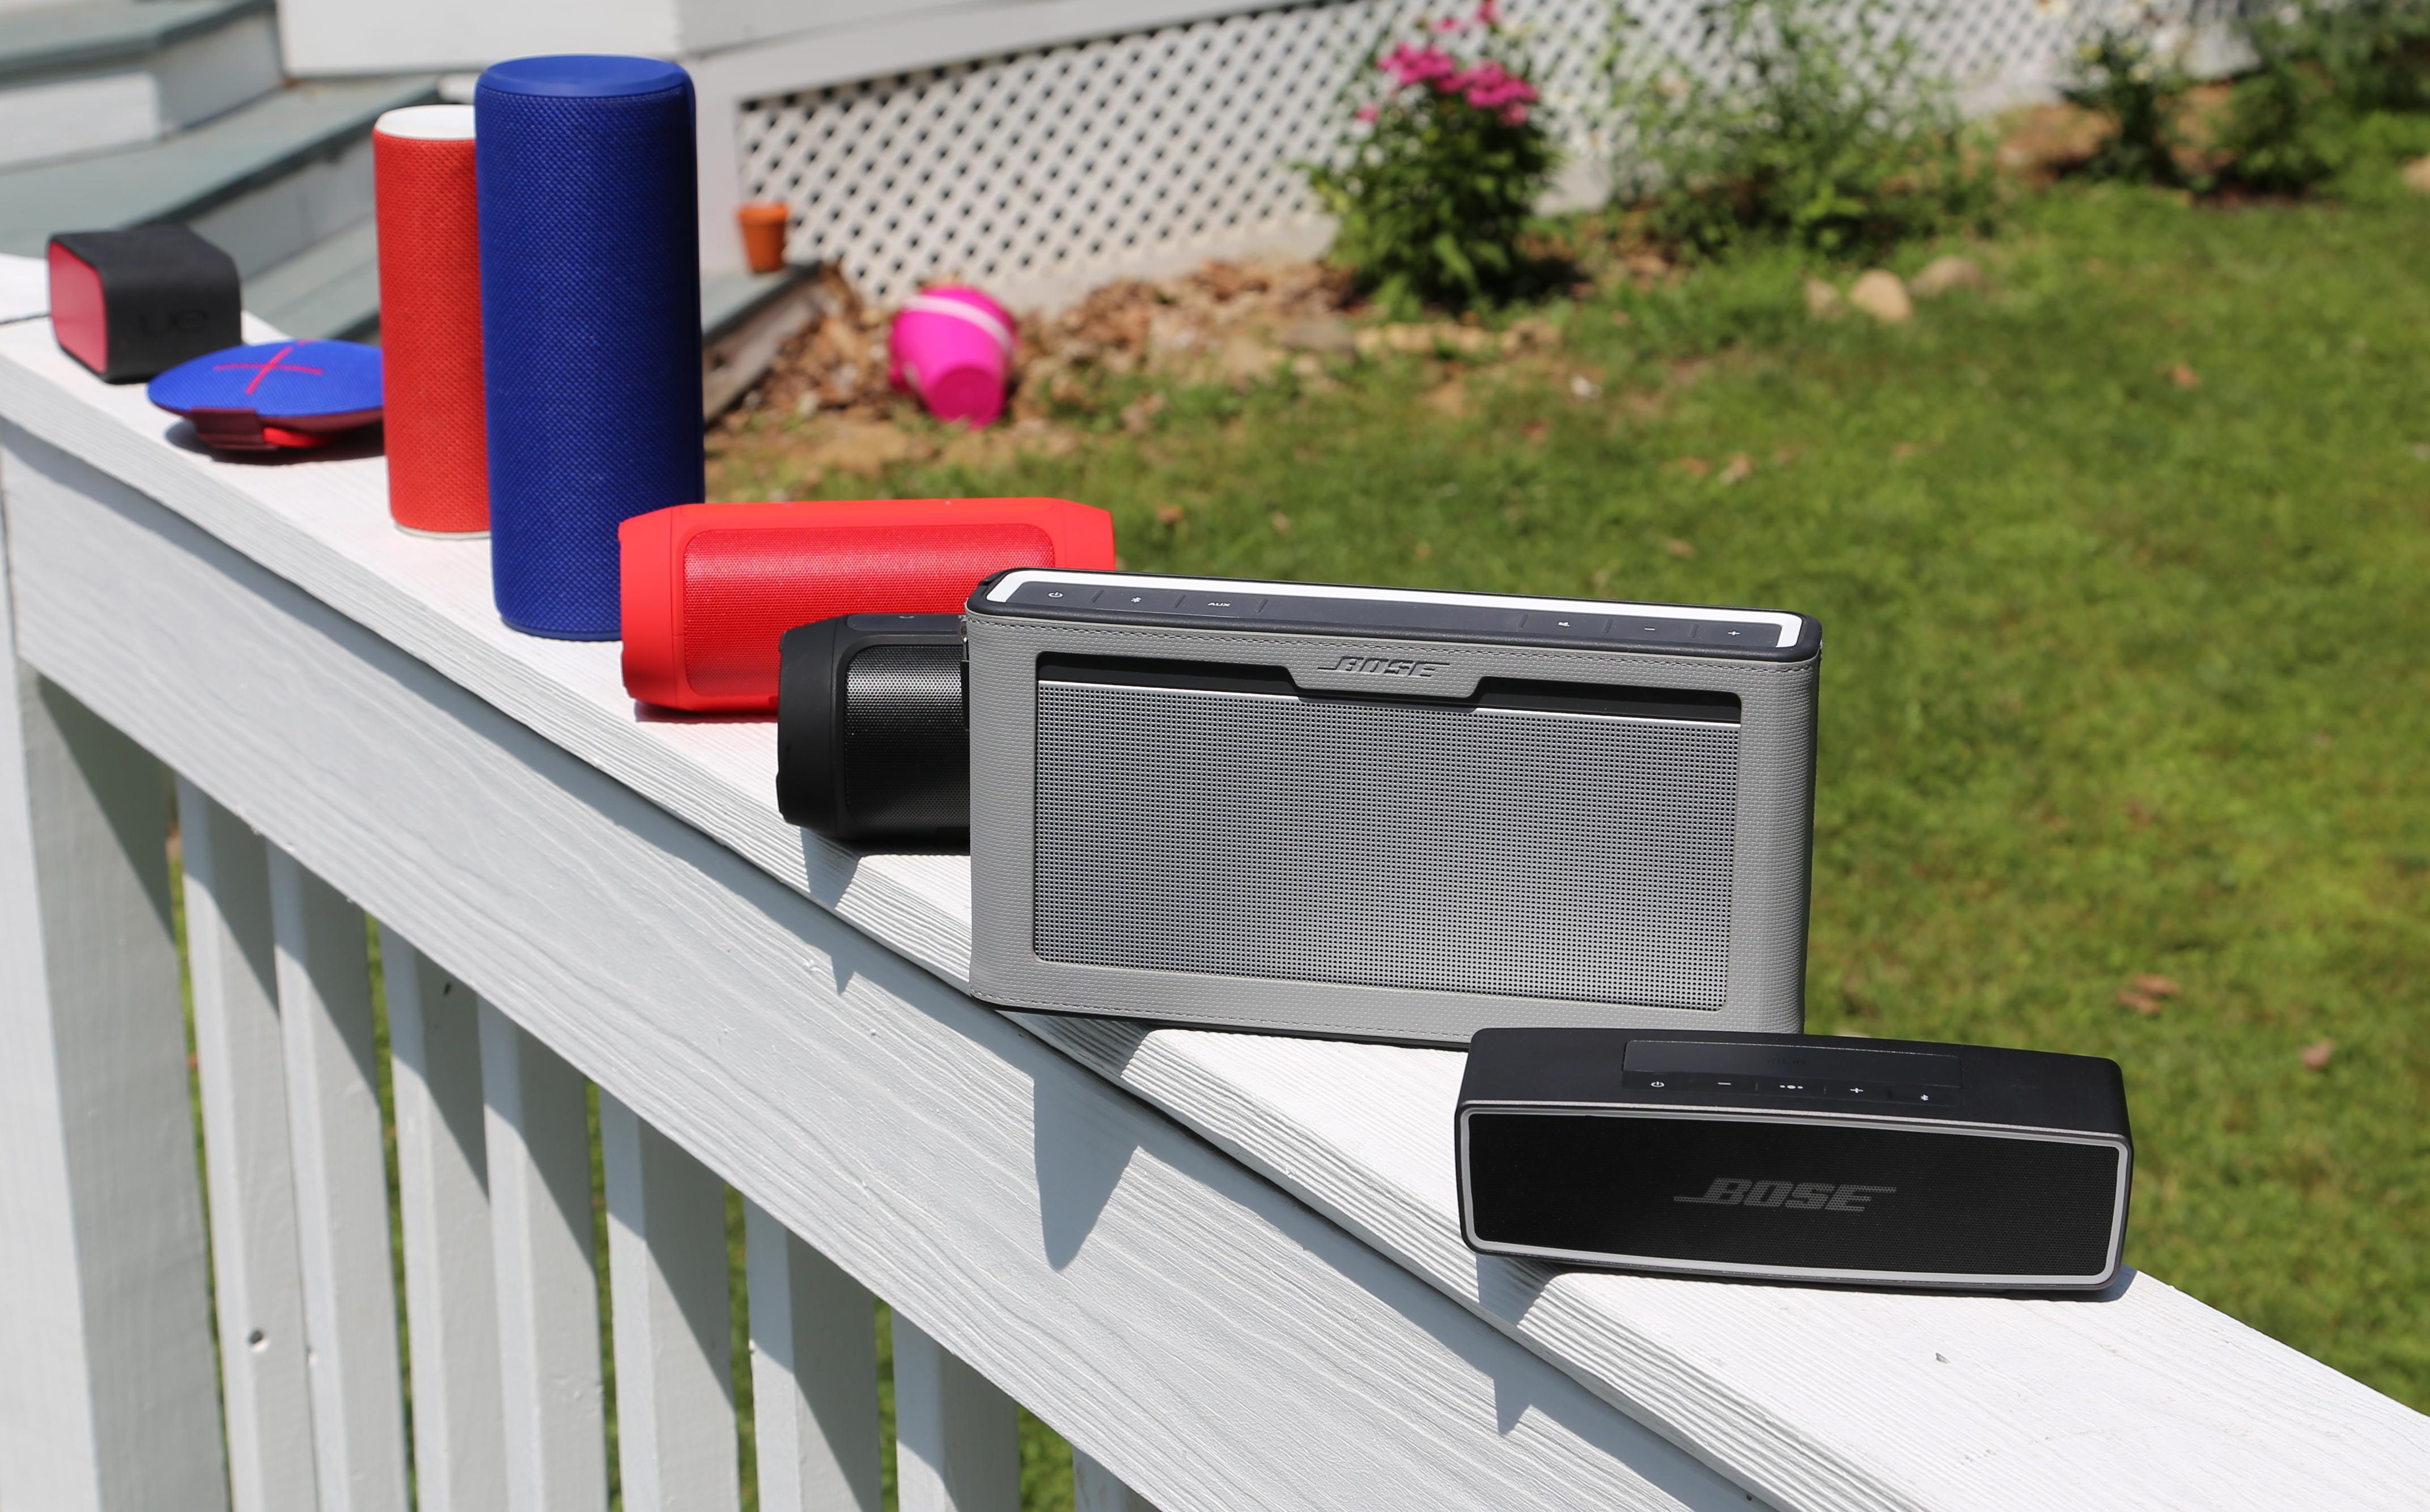 "<span href=""https://9to5mac.com/2015/07/24/best-bluetooth-speaker/"">Los Mejores Altavoces Bluetooth 2015: JBL Charge 2+, Bose Soundlink Mini II y UE Rollo/Megaboom</a>"